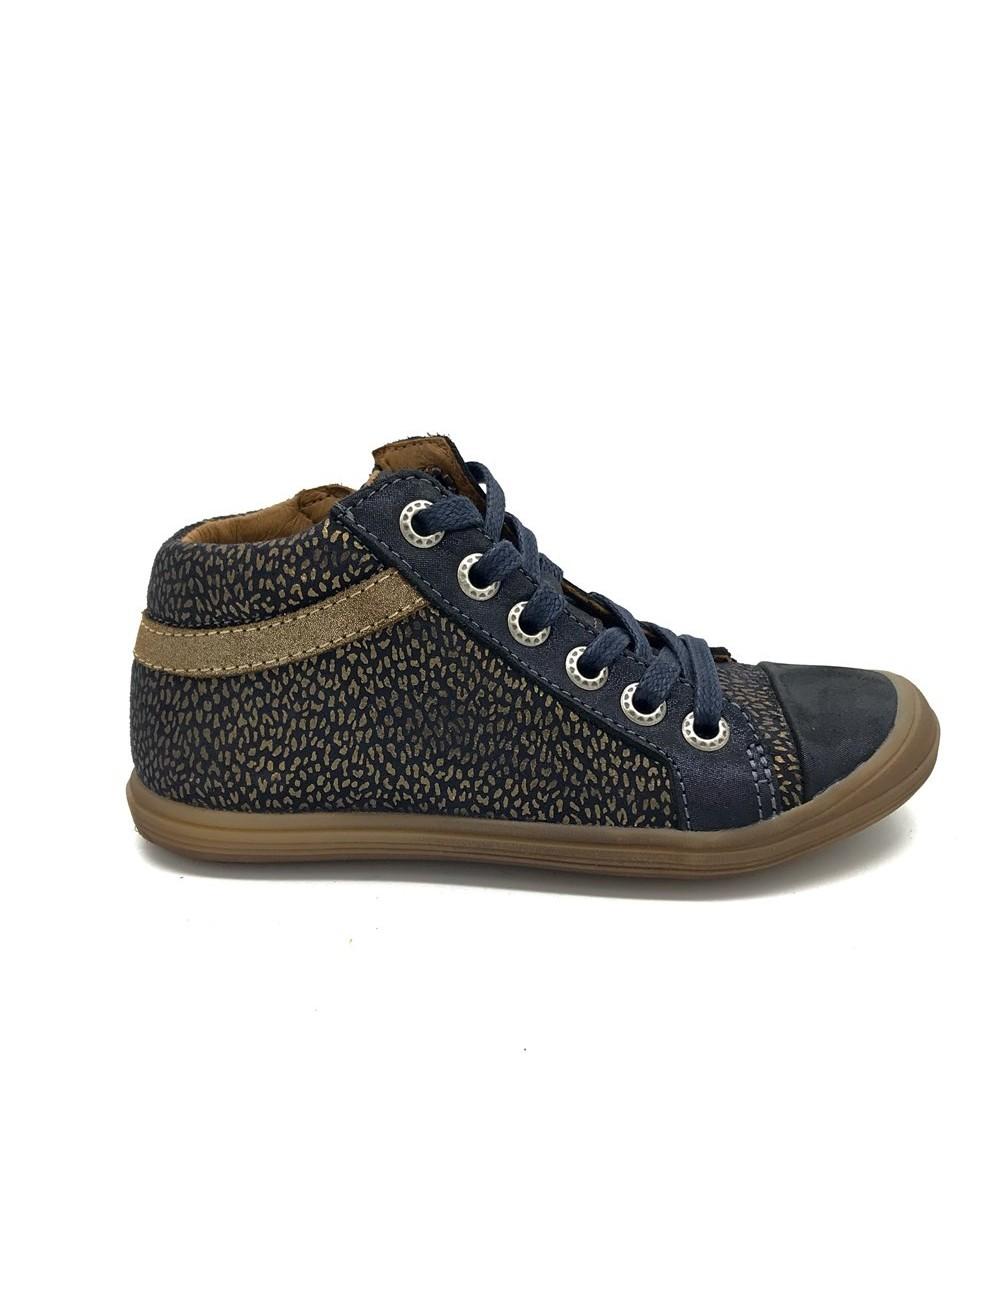 Chaussure montante lacets + zip Bellamy